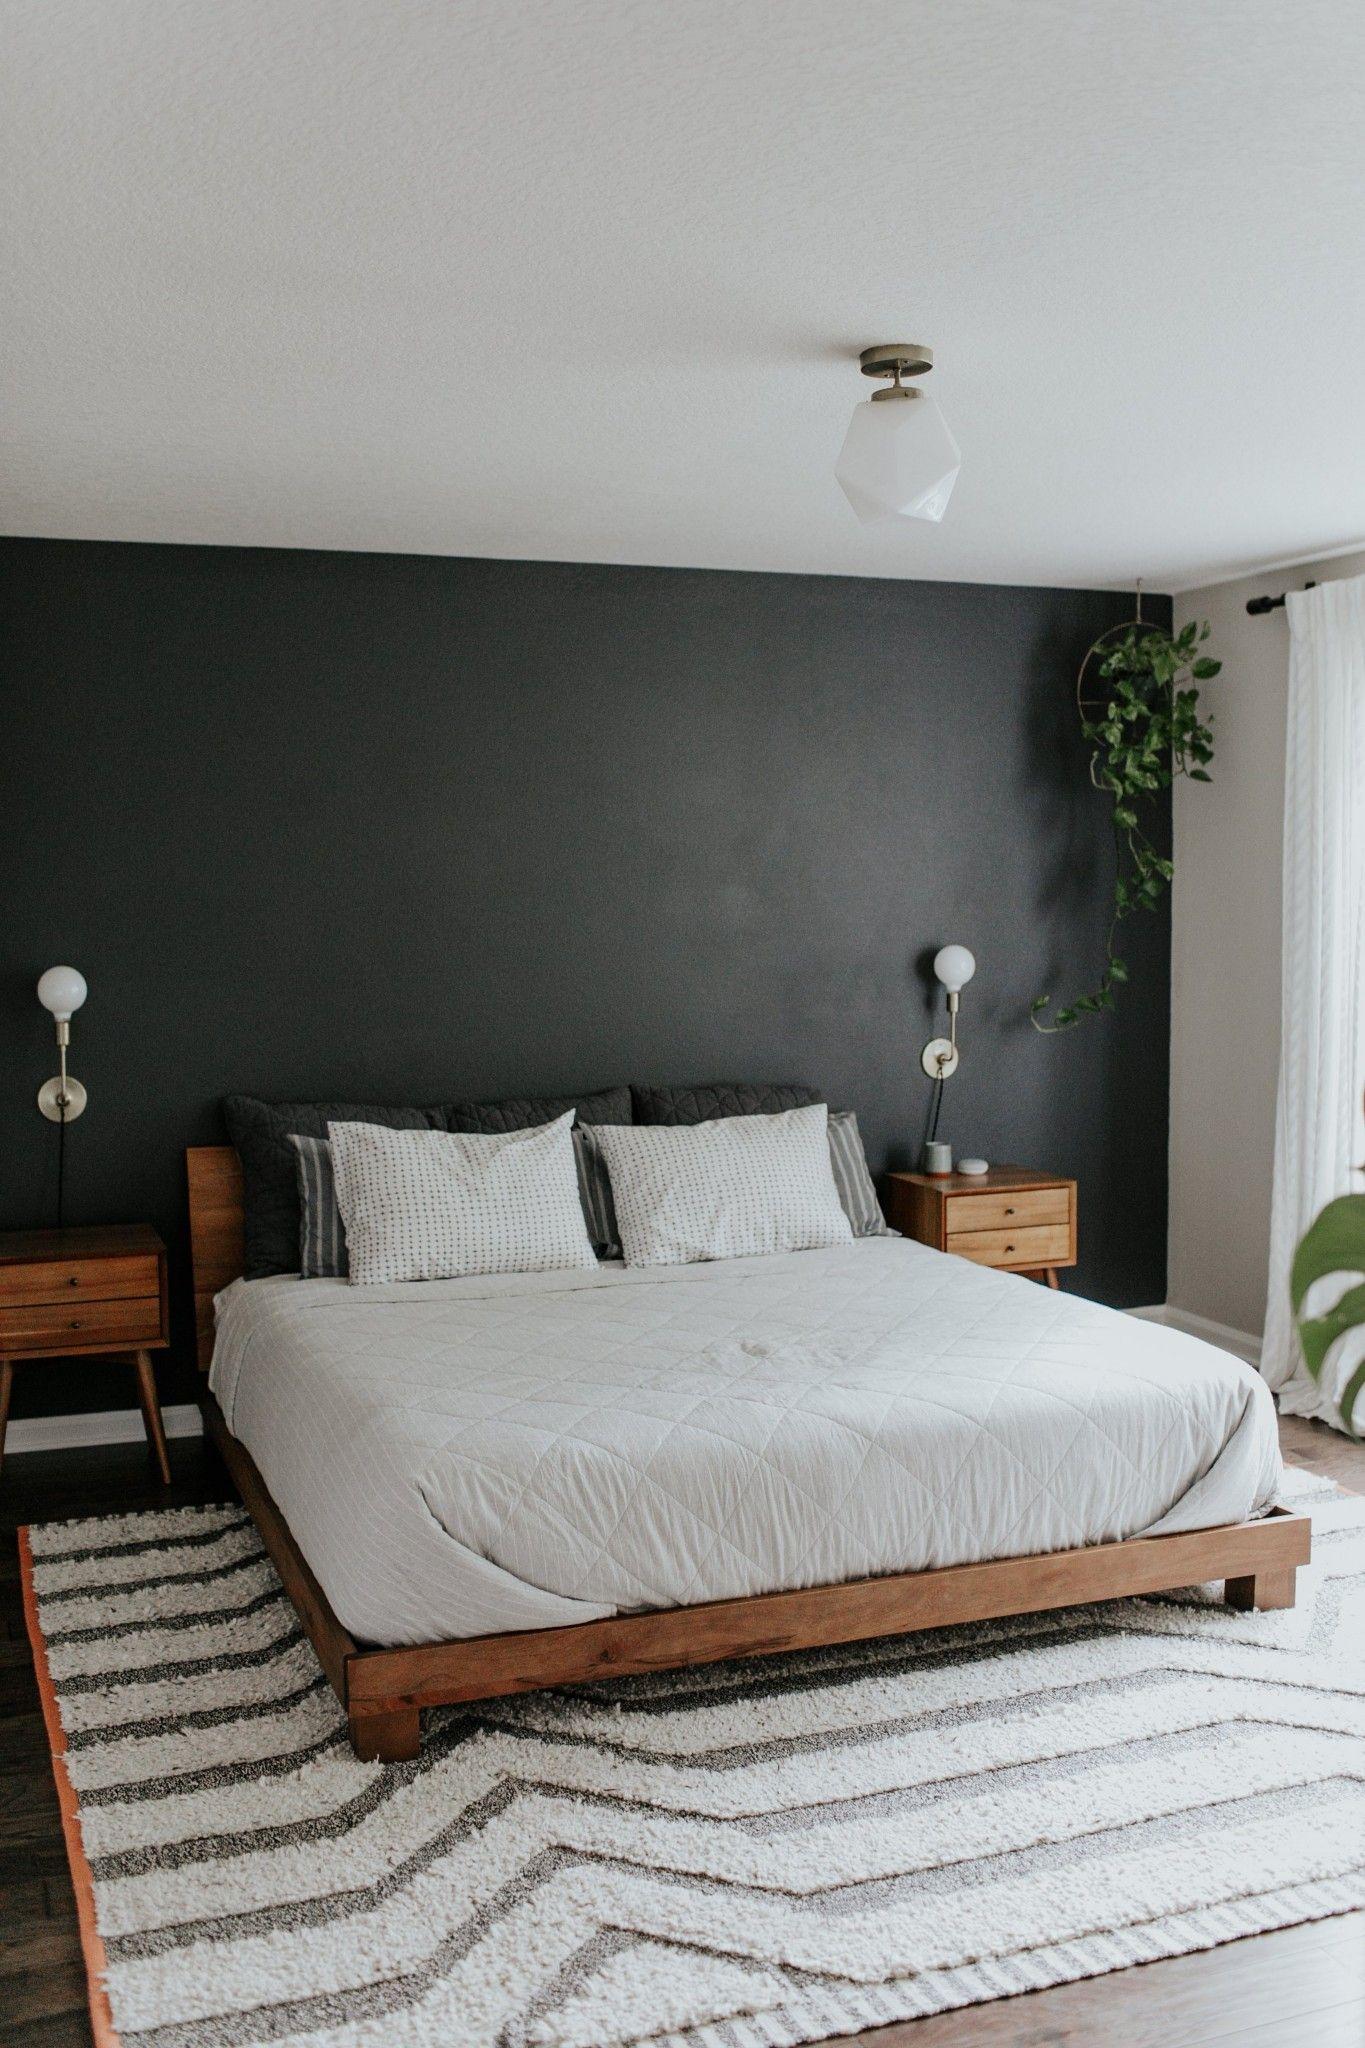 Black Accent Wall Wood Mid Century Modern Nightstands Platform